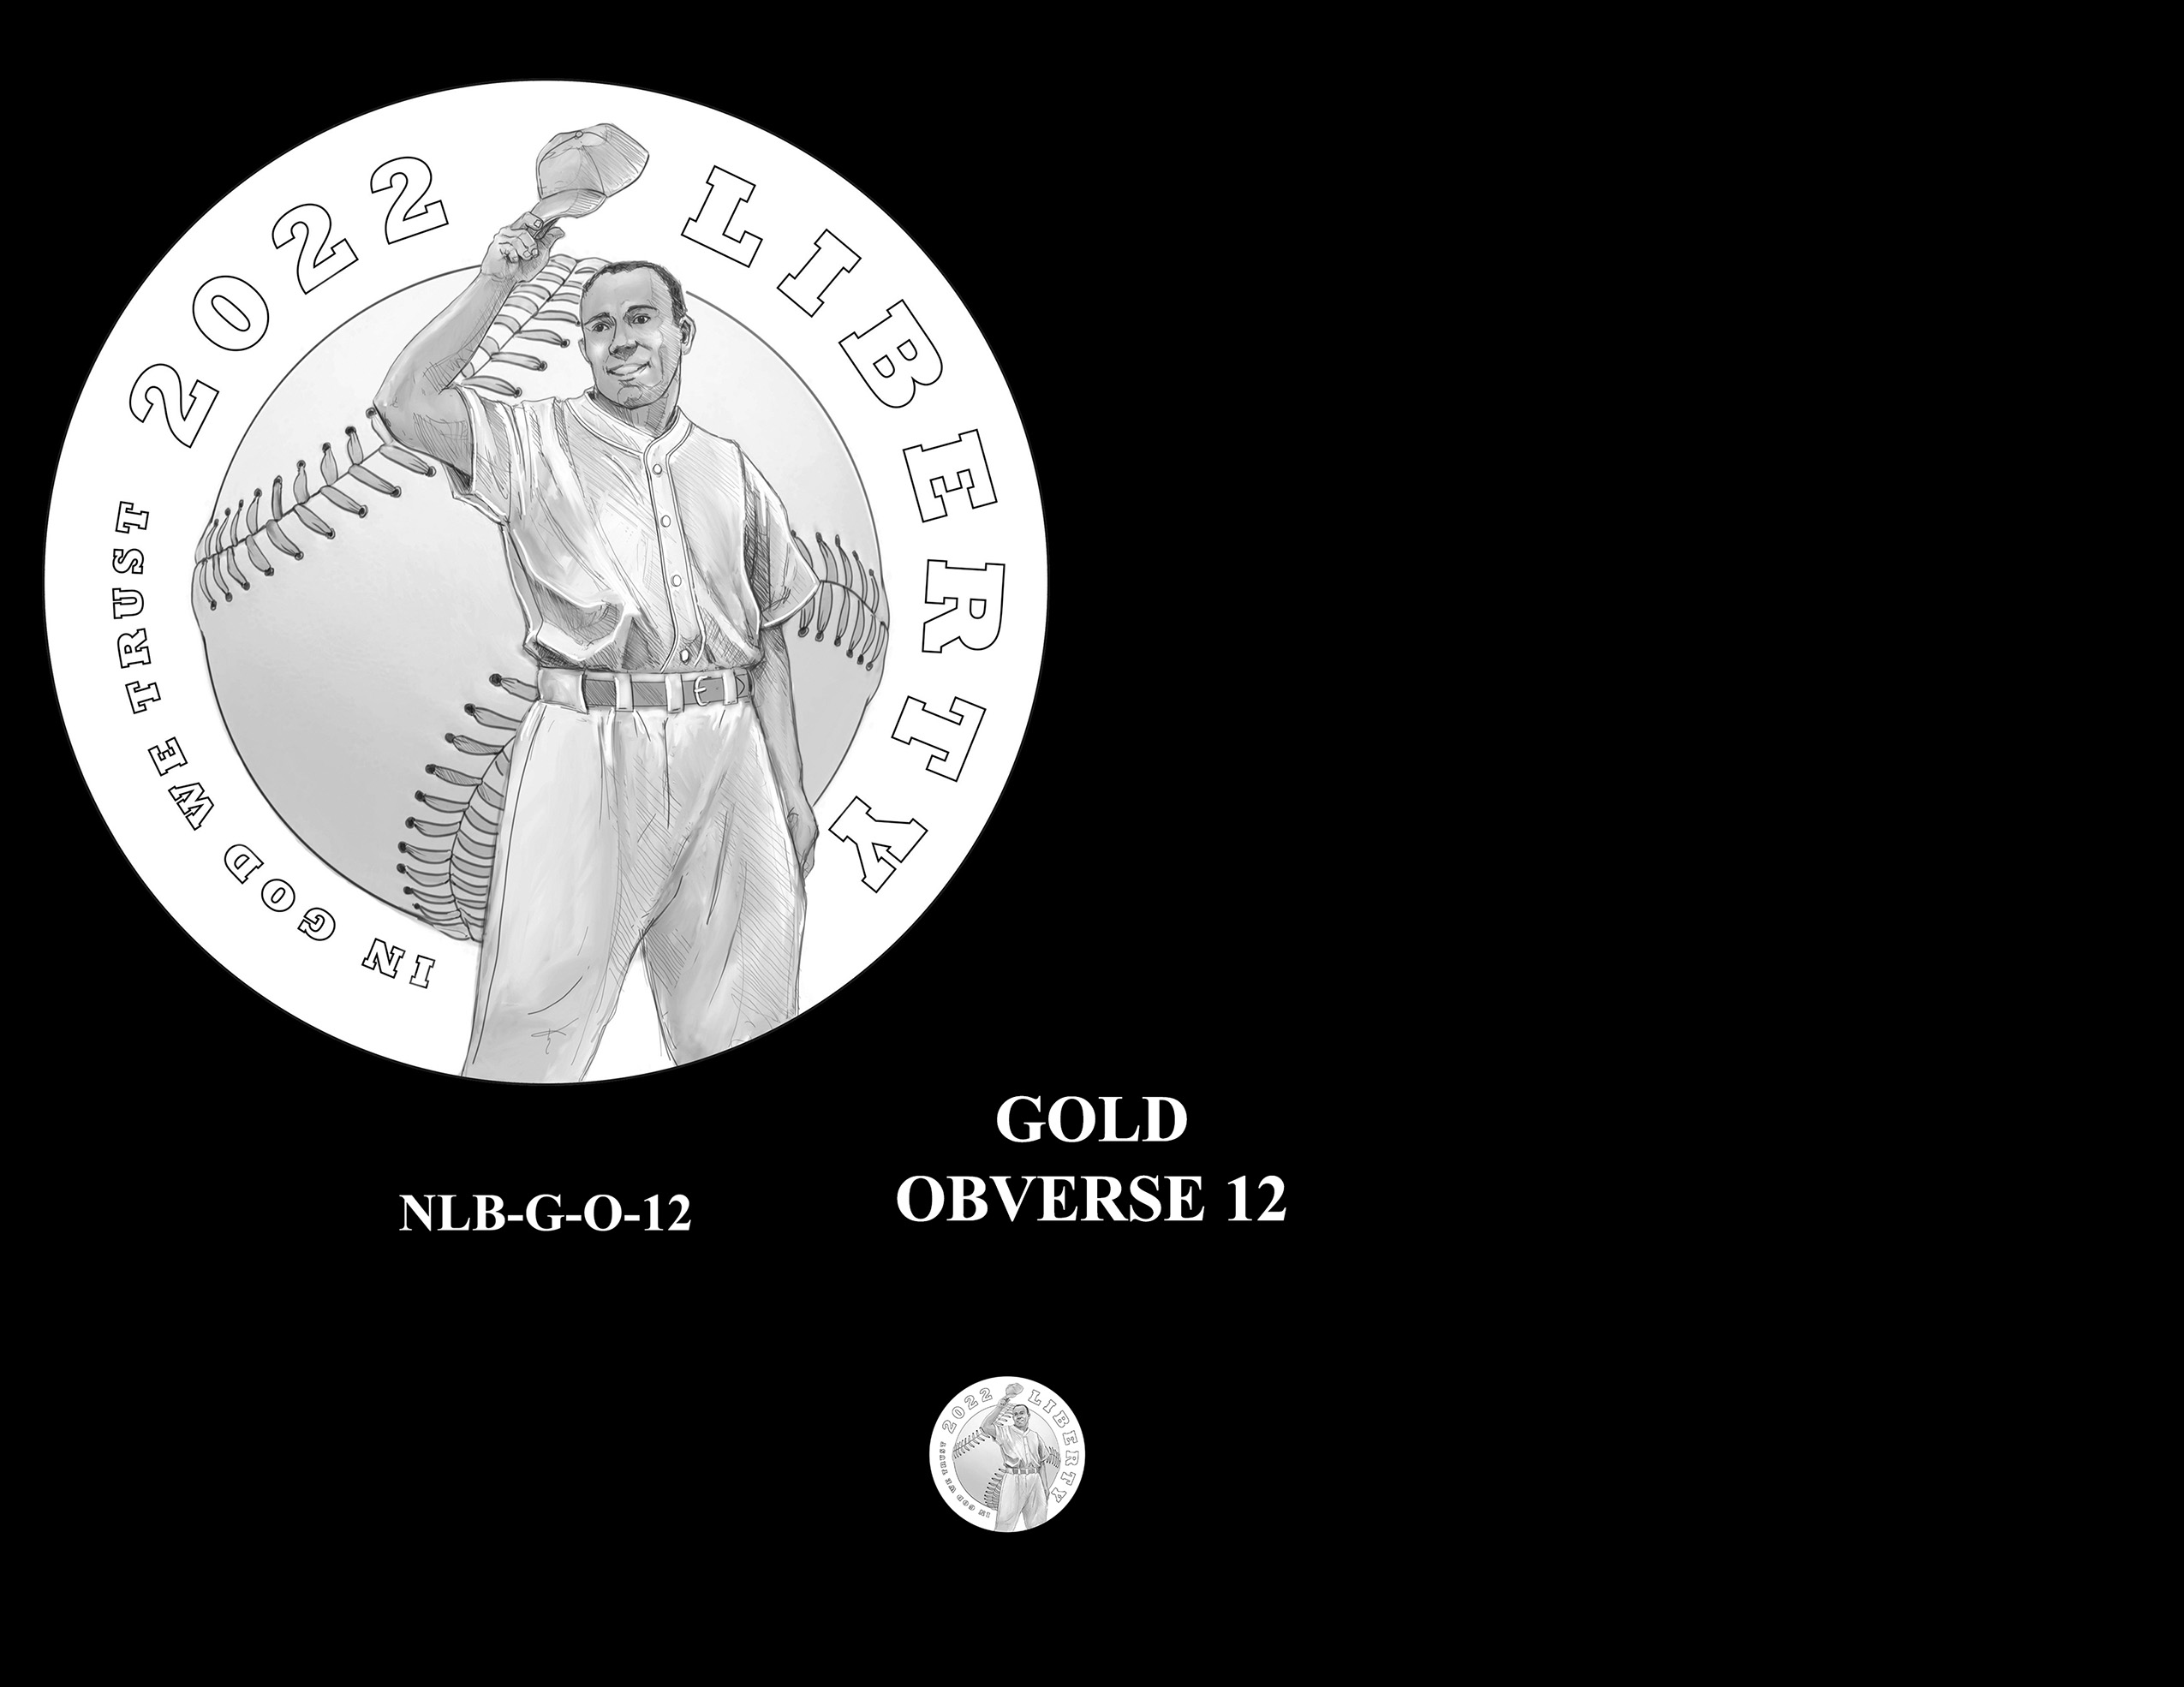 Gold Pair 12 -- Negro Leagues Baseball Commemorative Coin Program